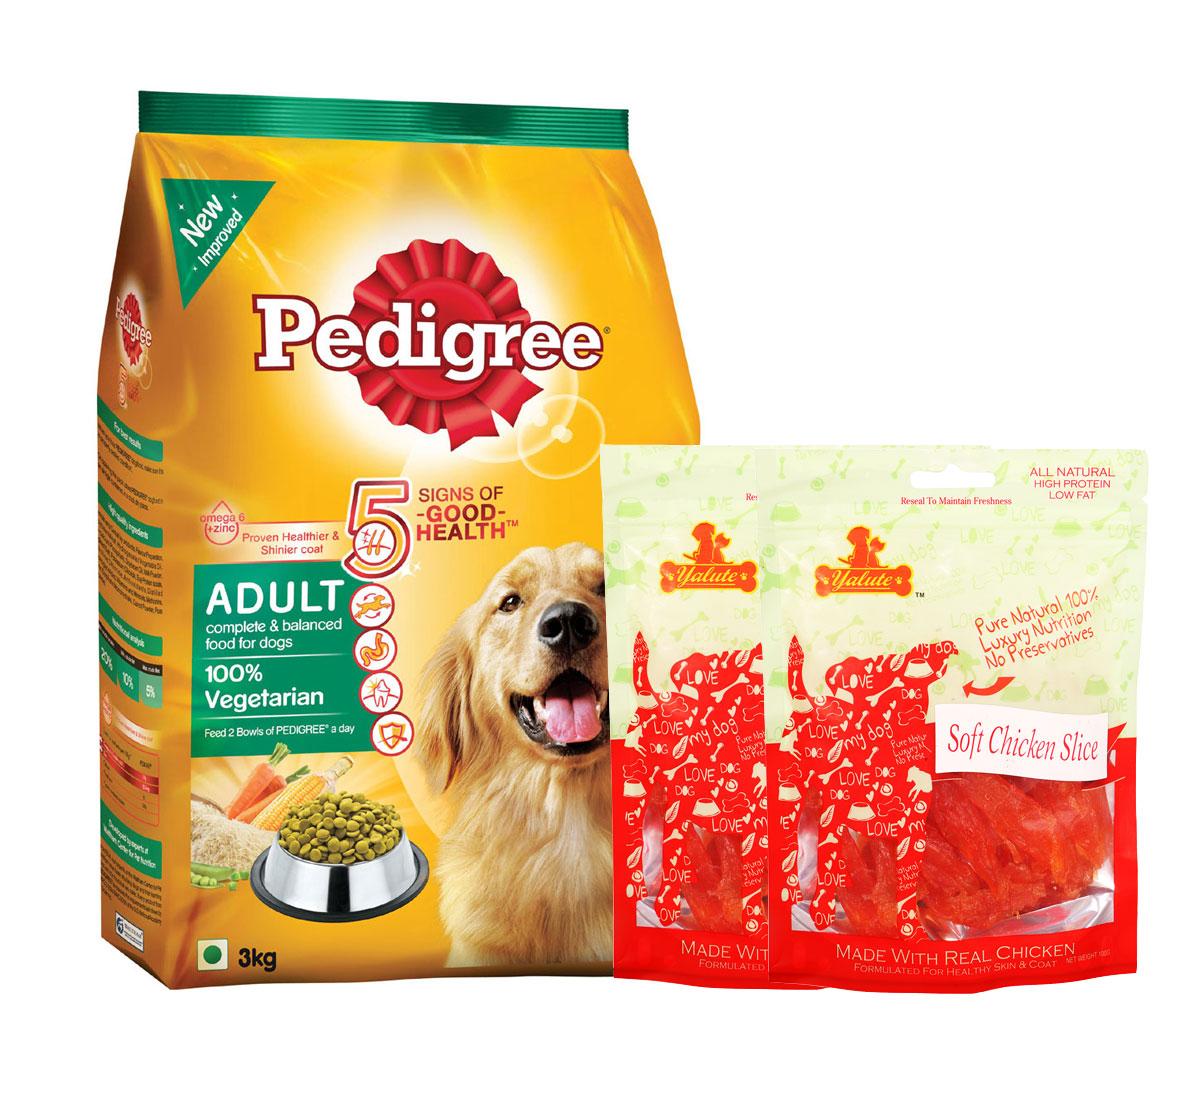 Pedigree Dog Food Adult 100% Vegetarian - 3 Kg  With Chicken Slices